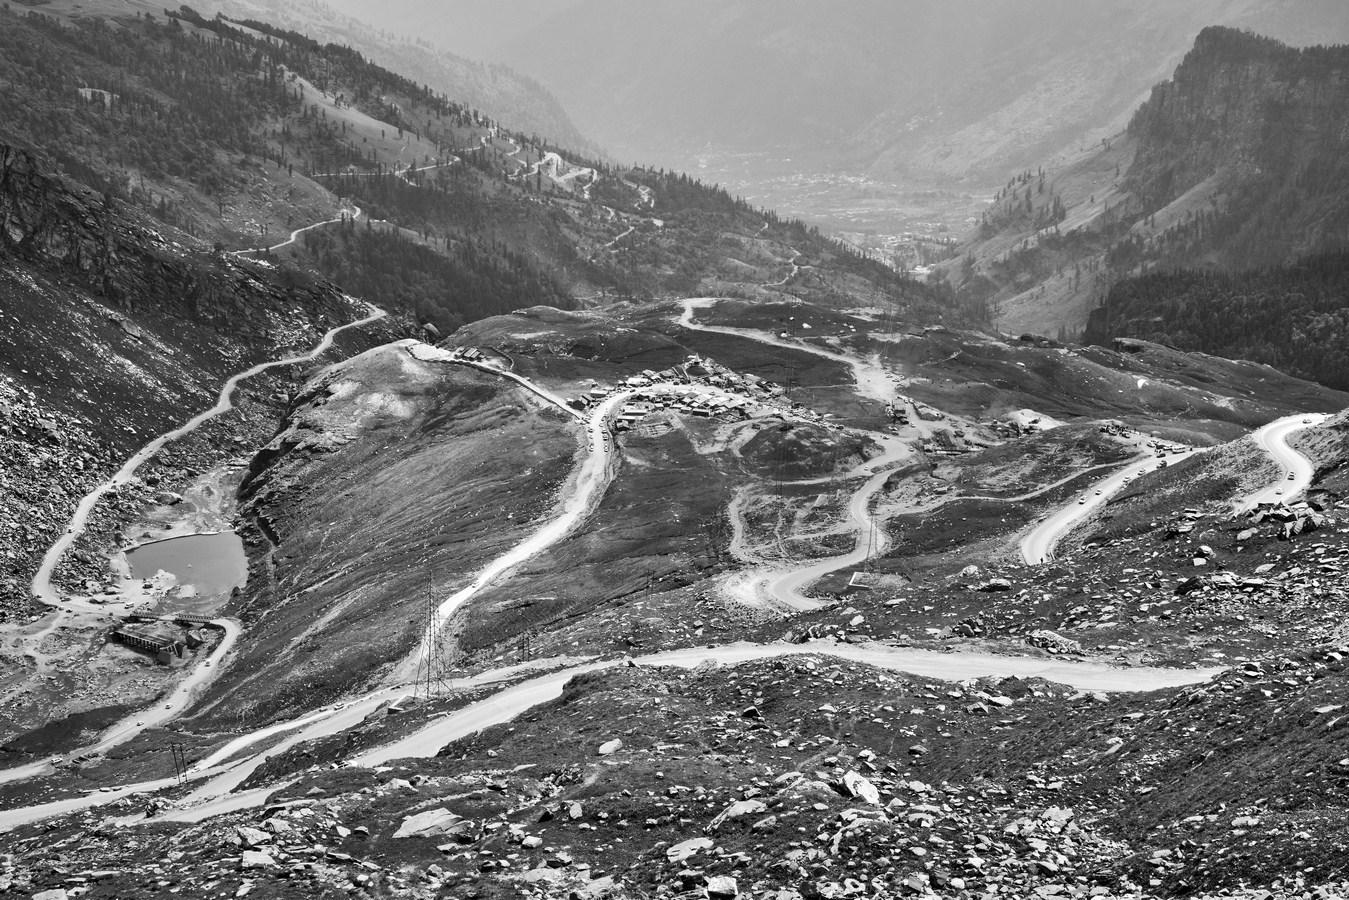 "Marhi,Rohtang Pass,Himachal Pradesh, India | Photograph | 24"" x 36"" | 2016"